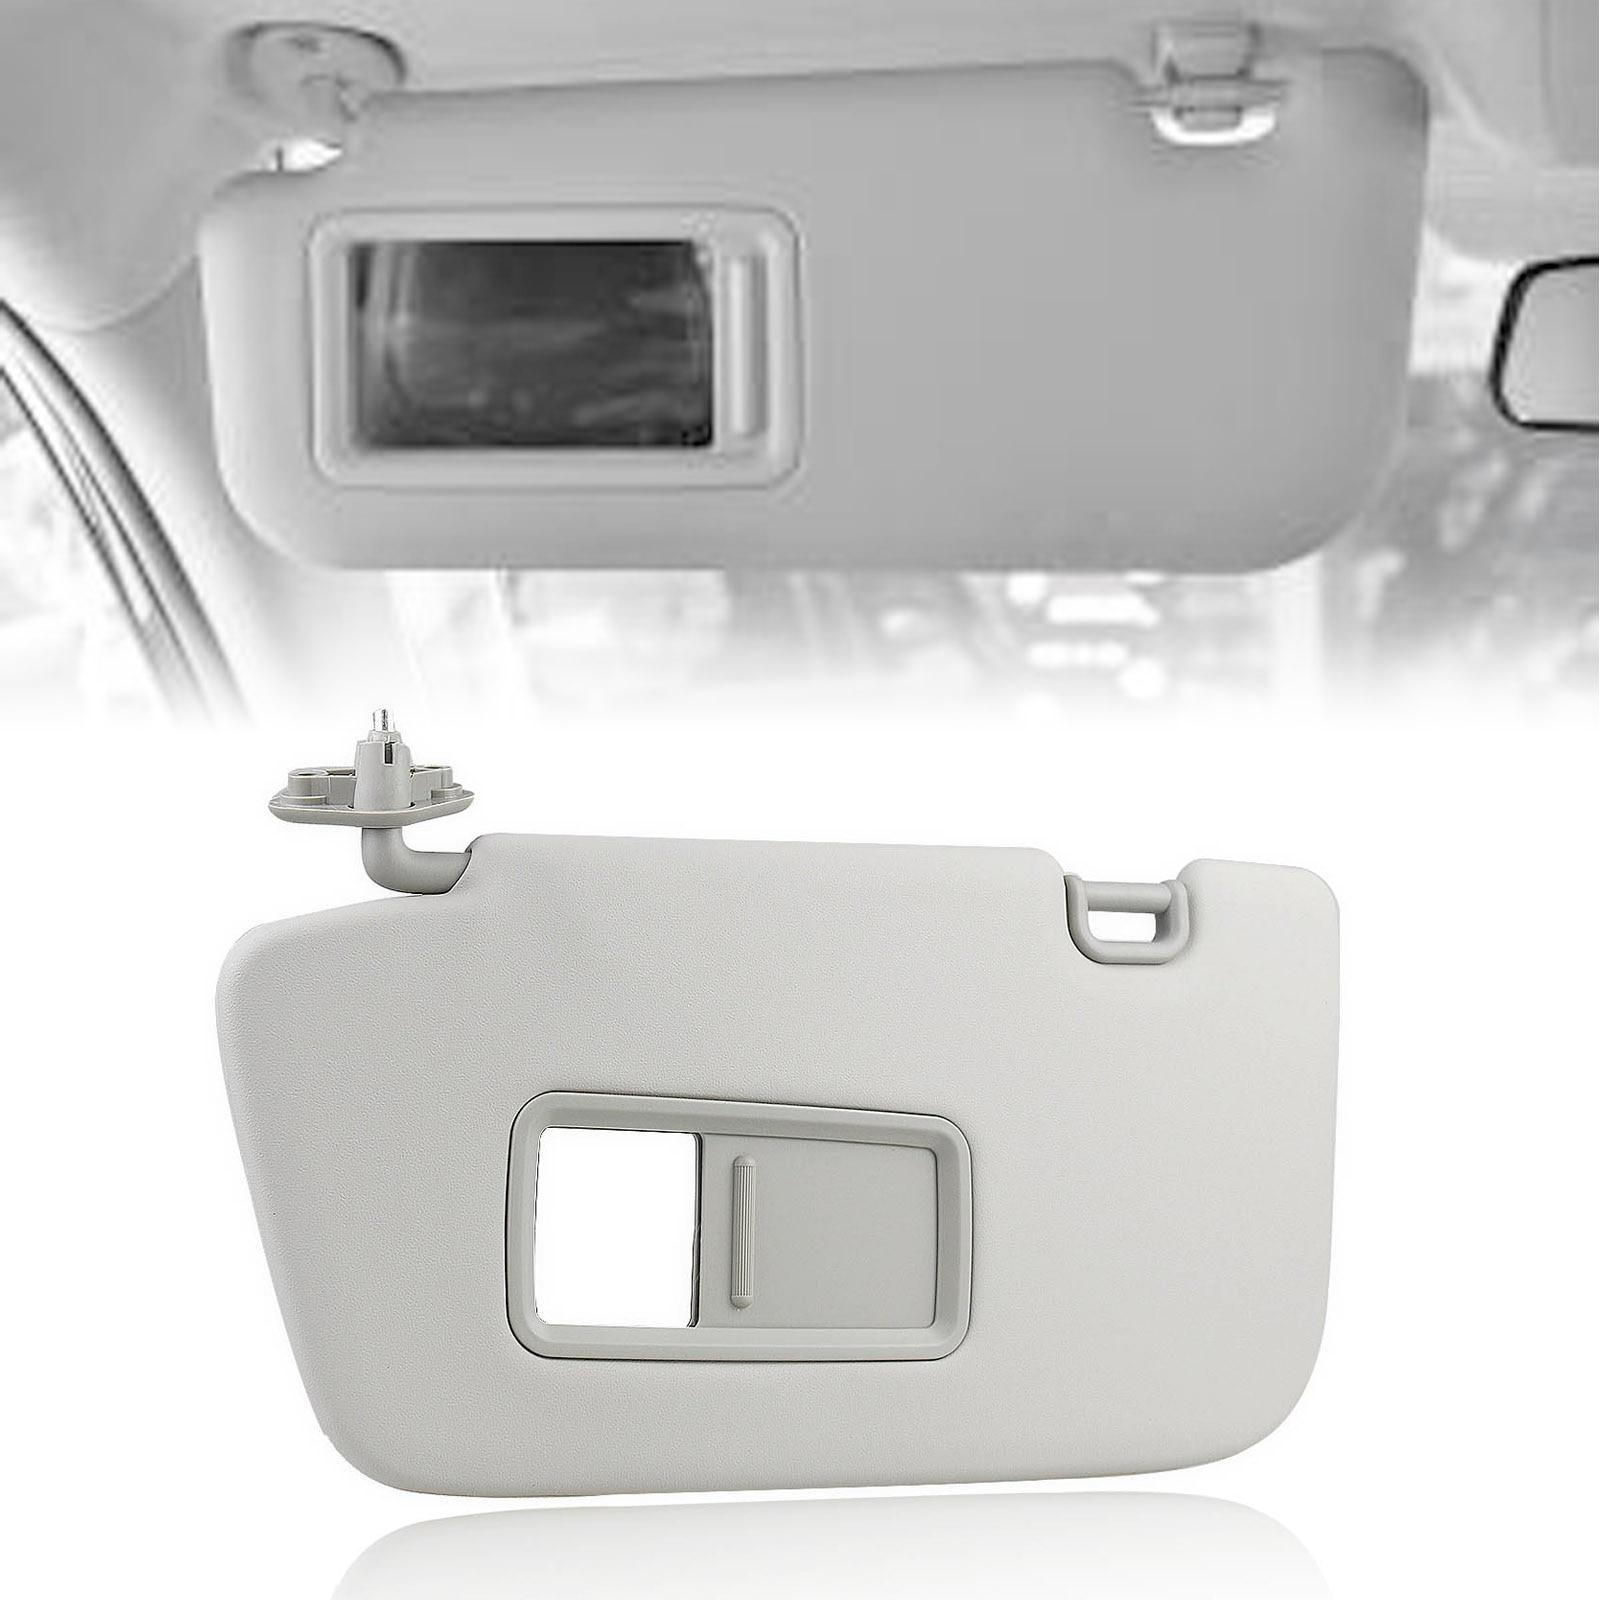 aliexpress.com - Sun Visor For Subaru Impreza WRX STI 2008-2014 Left Driver Side Interior Car Gray Window Cover Sunvisor Shield With Mirror Light